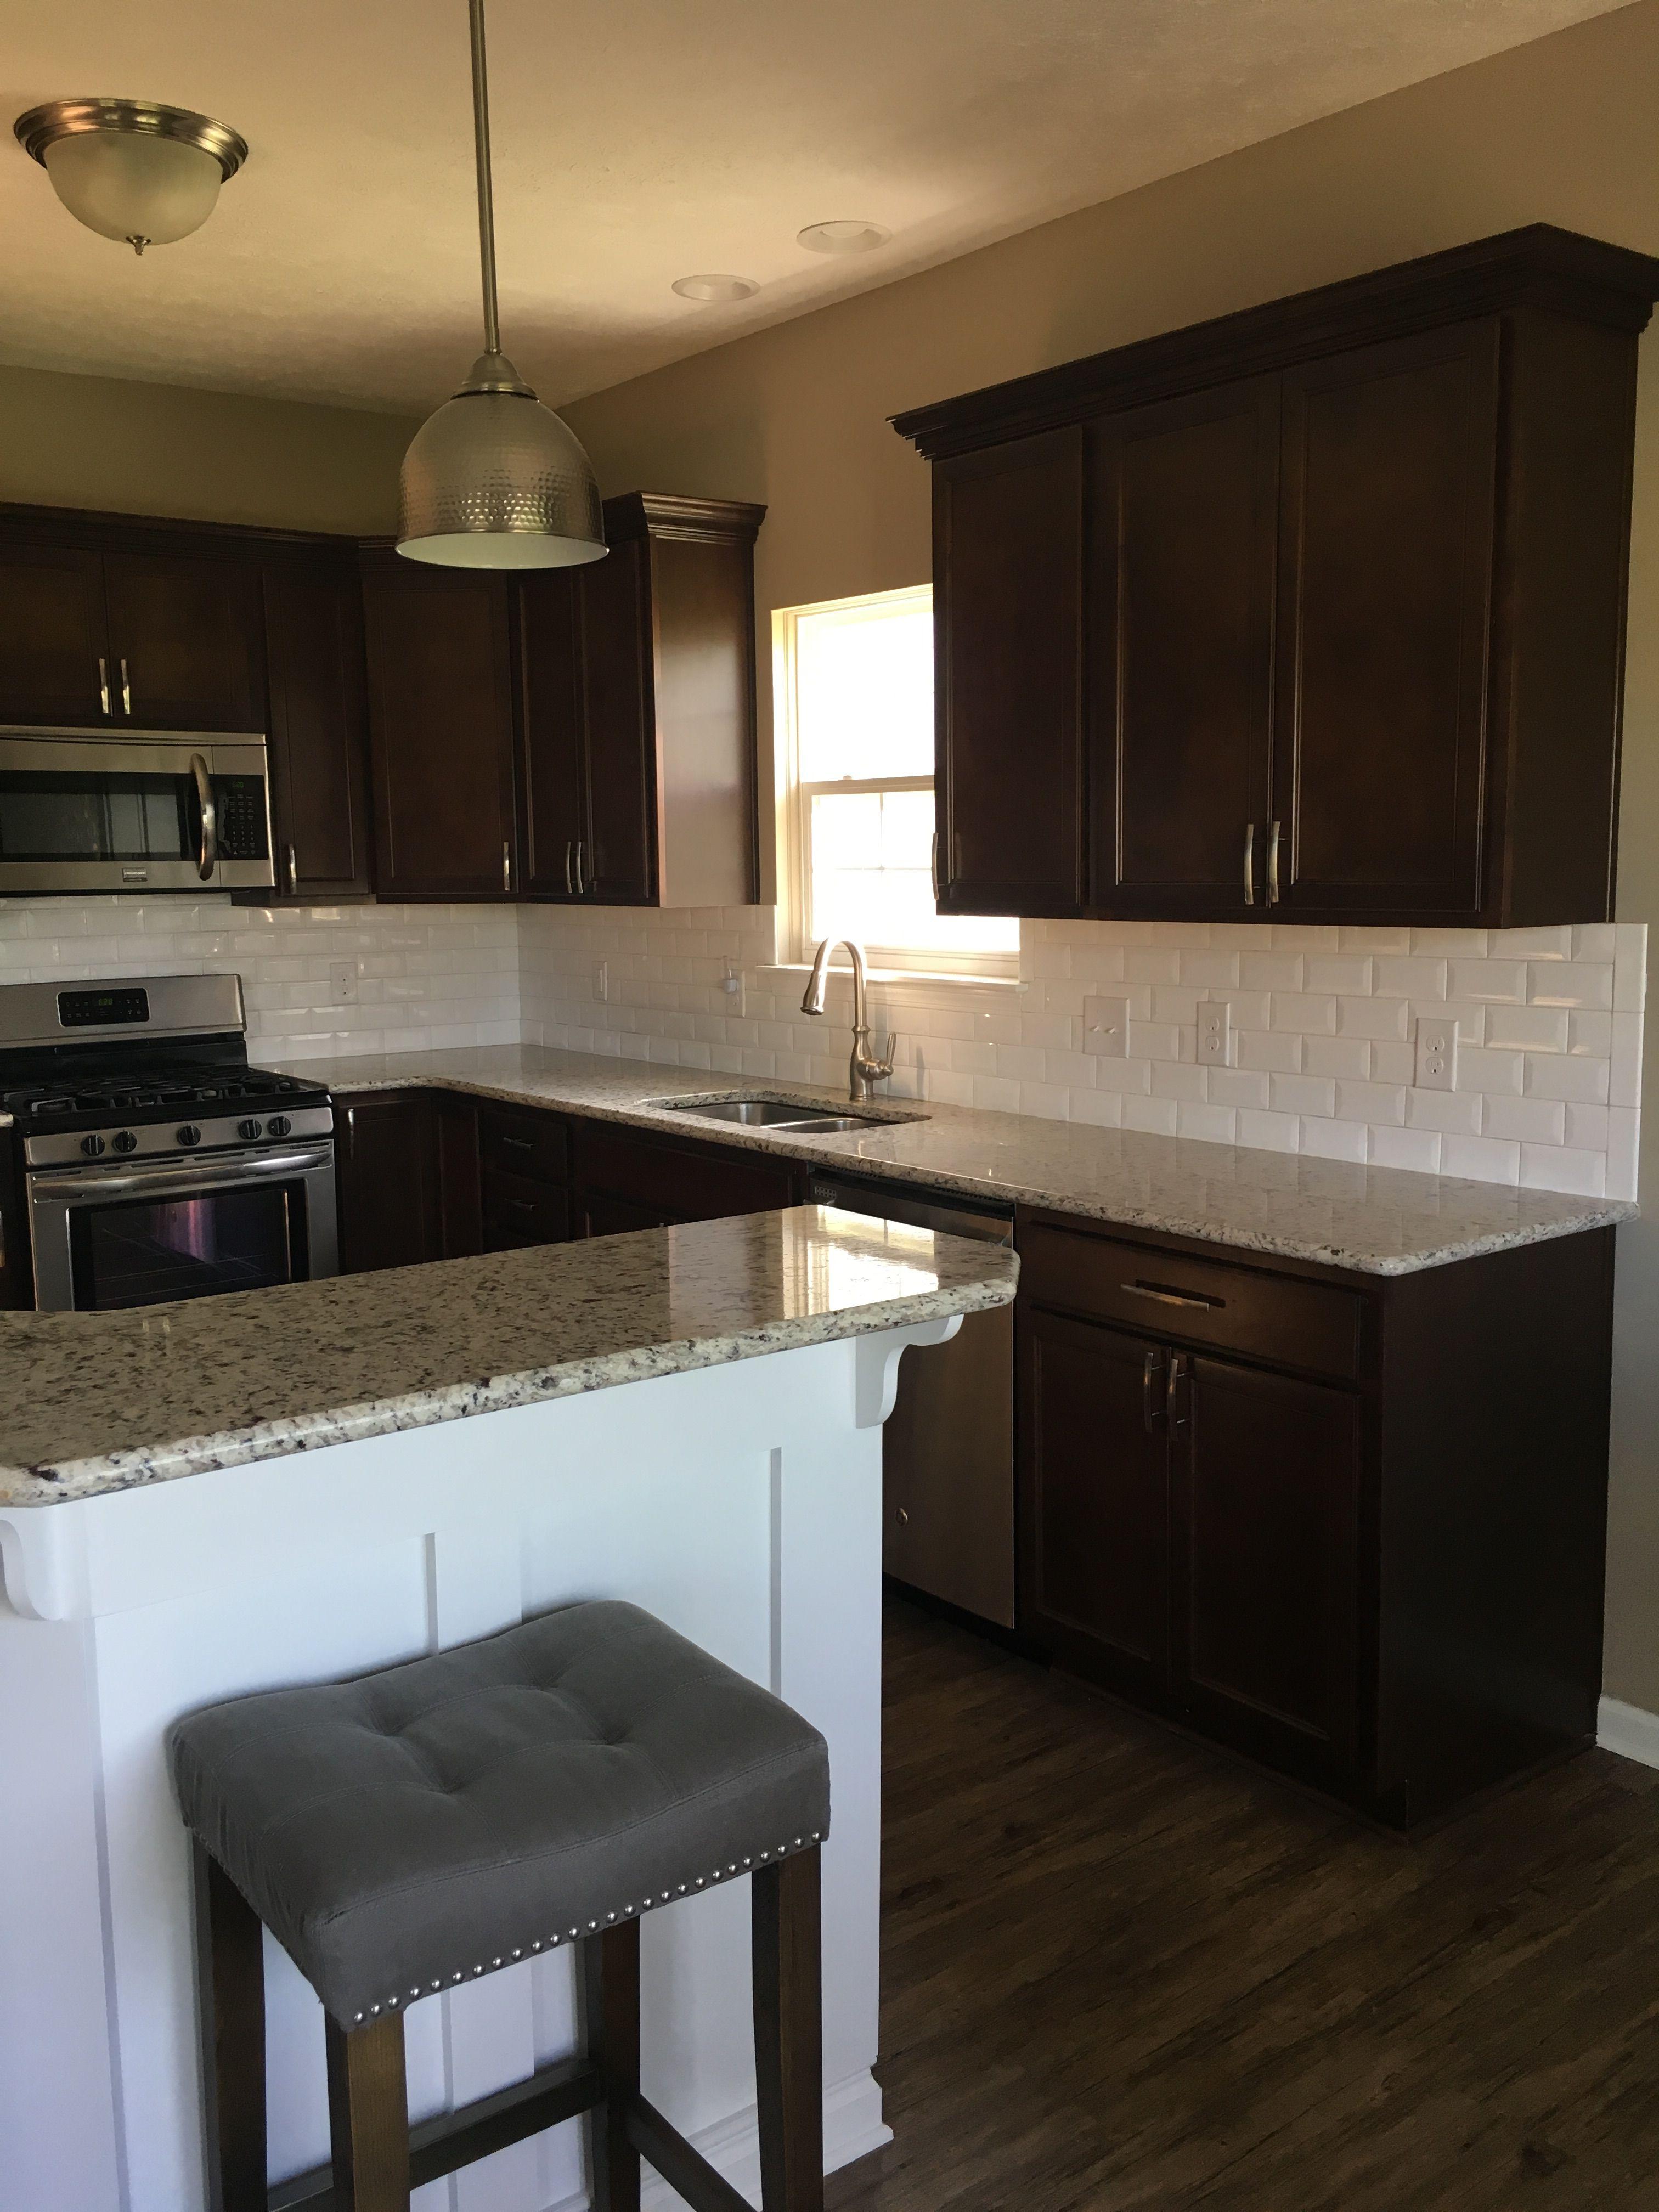 White beveled subway tile; dark cabinets (Umber); light ... on Backsplash Ideas For Dark Cabinets And Light Countertops  id=54549